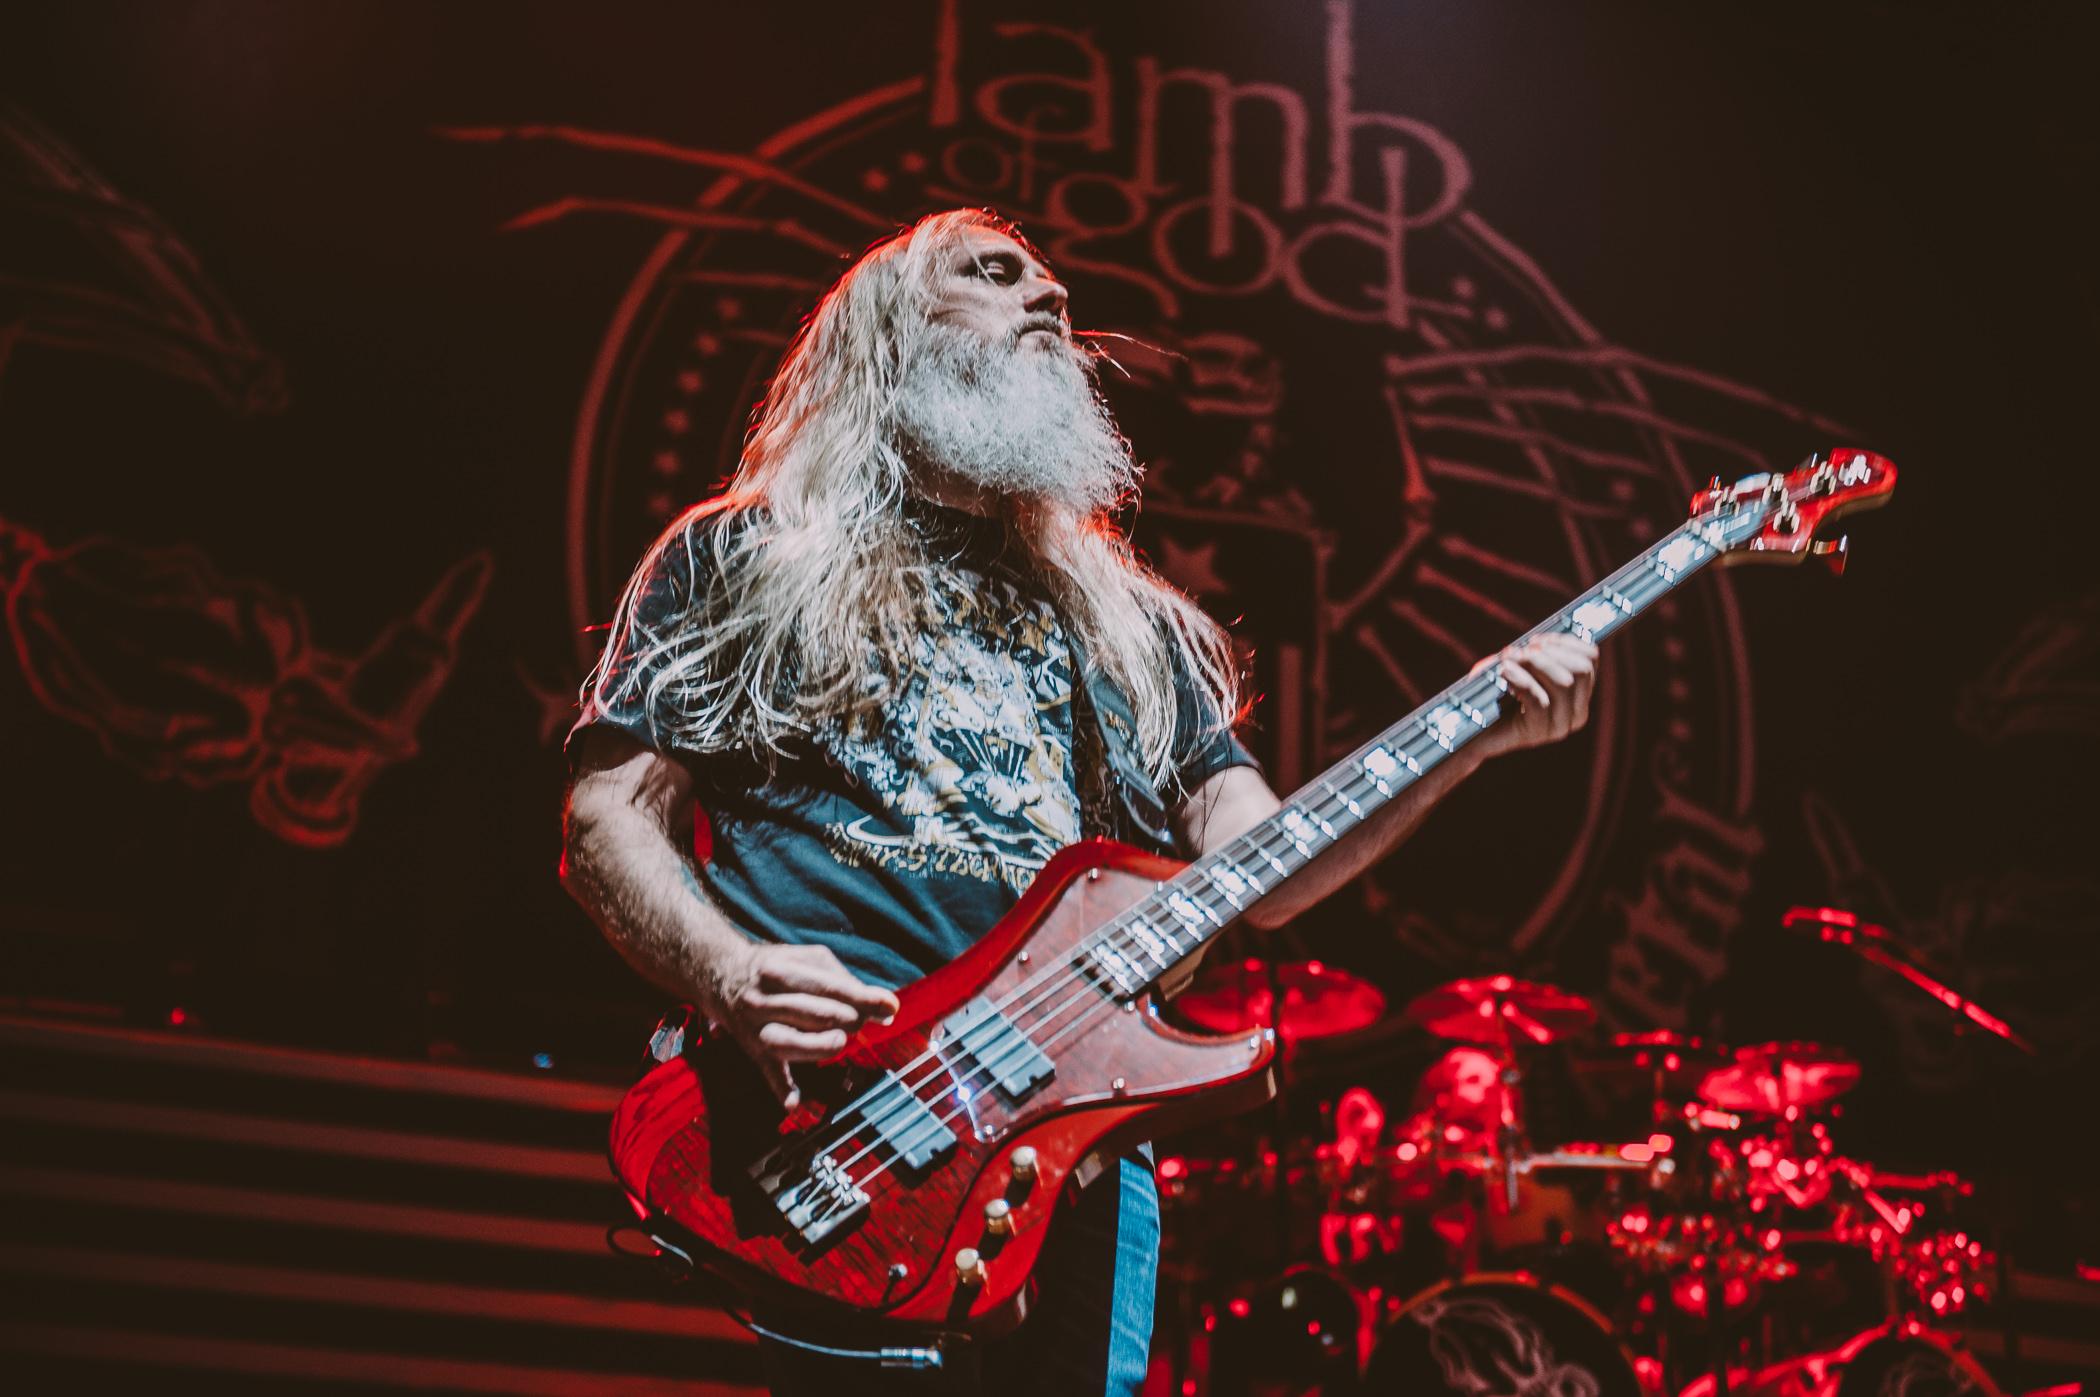 1_Lamb_Of_God-Pacific_Coliseum-Vancouver-Timothy_Nguyen-20180516 (11 of 47).jpg